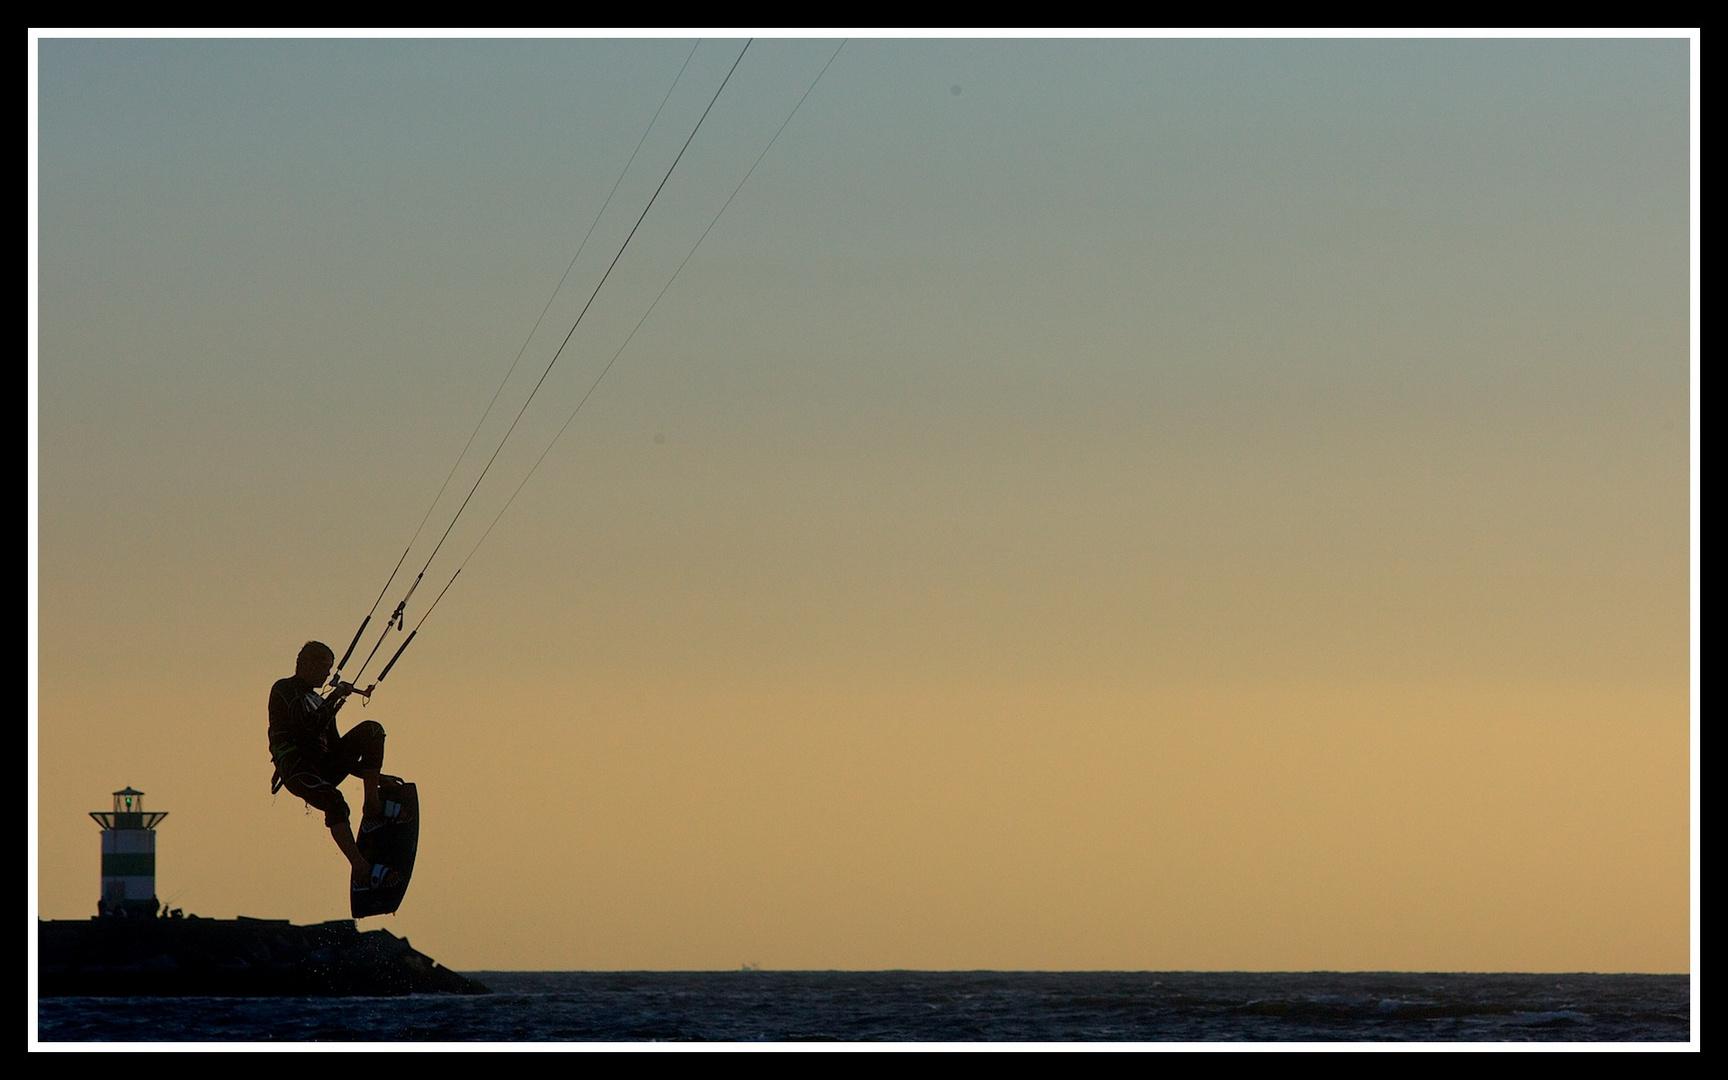 Silhouette eines Kitesurfers